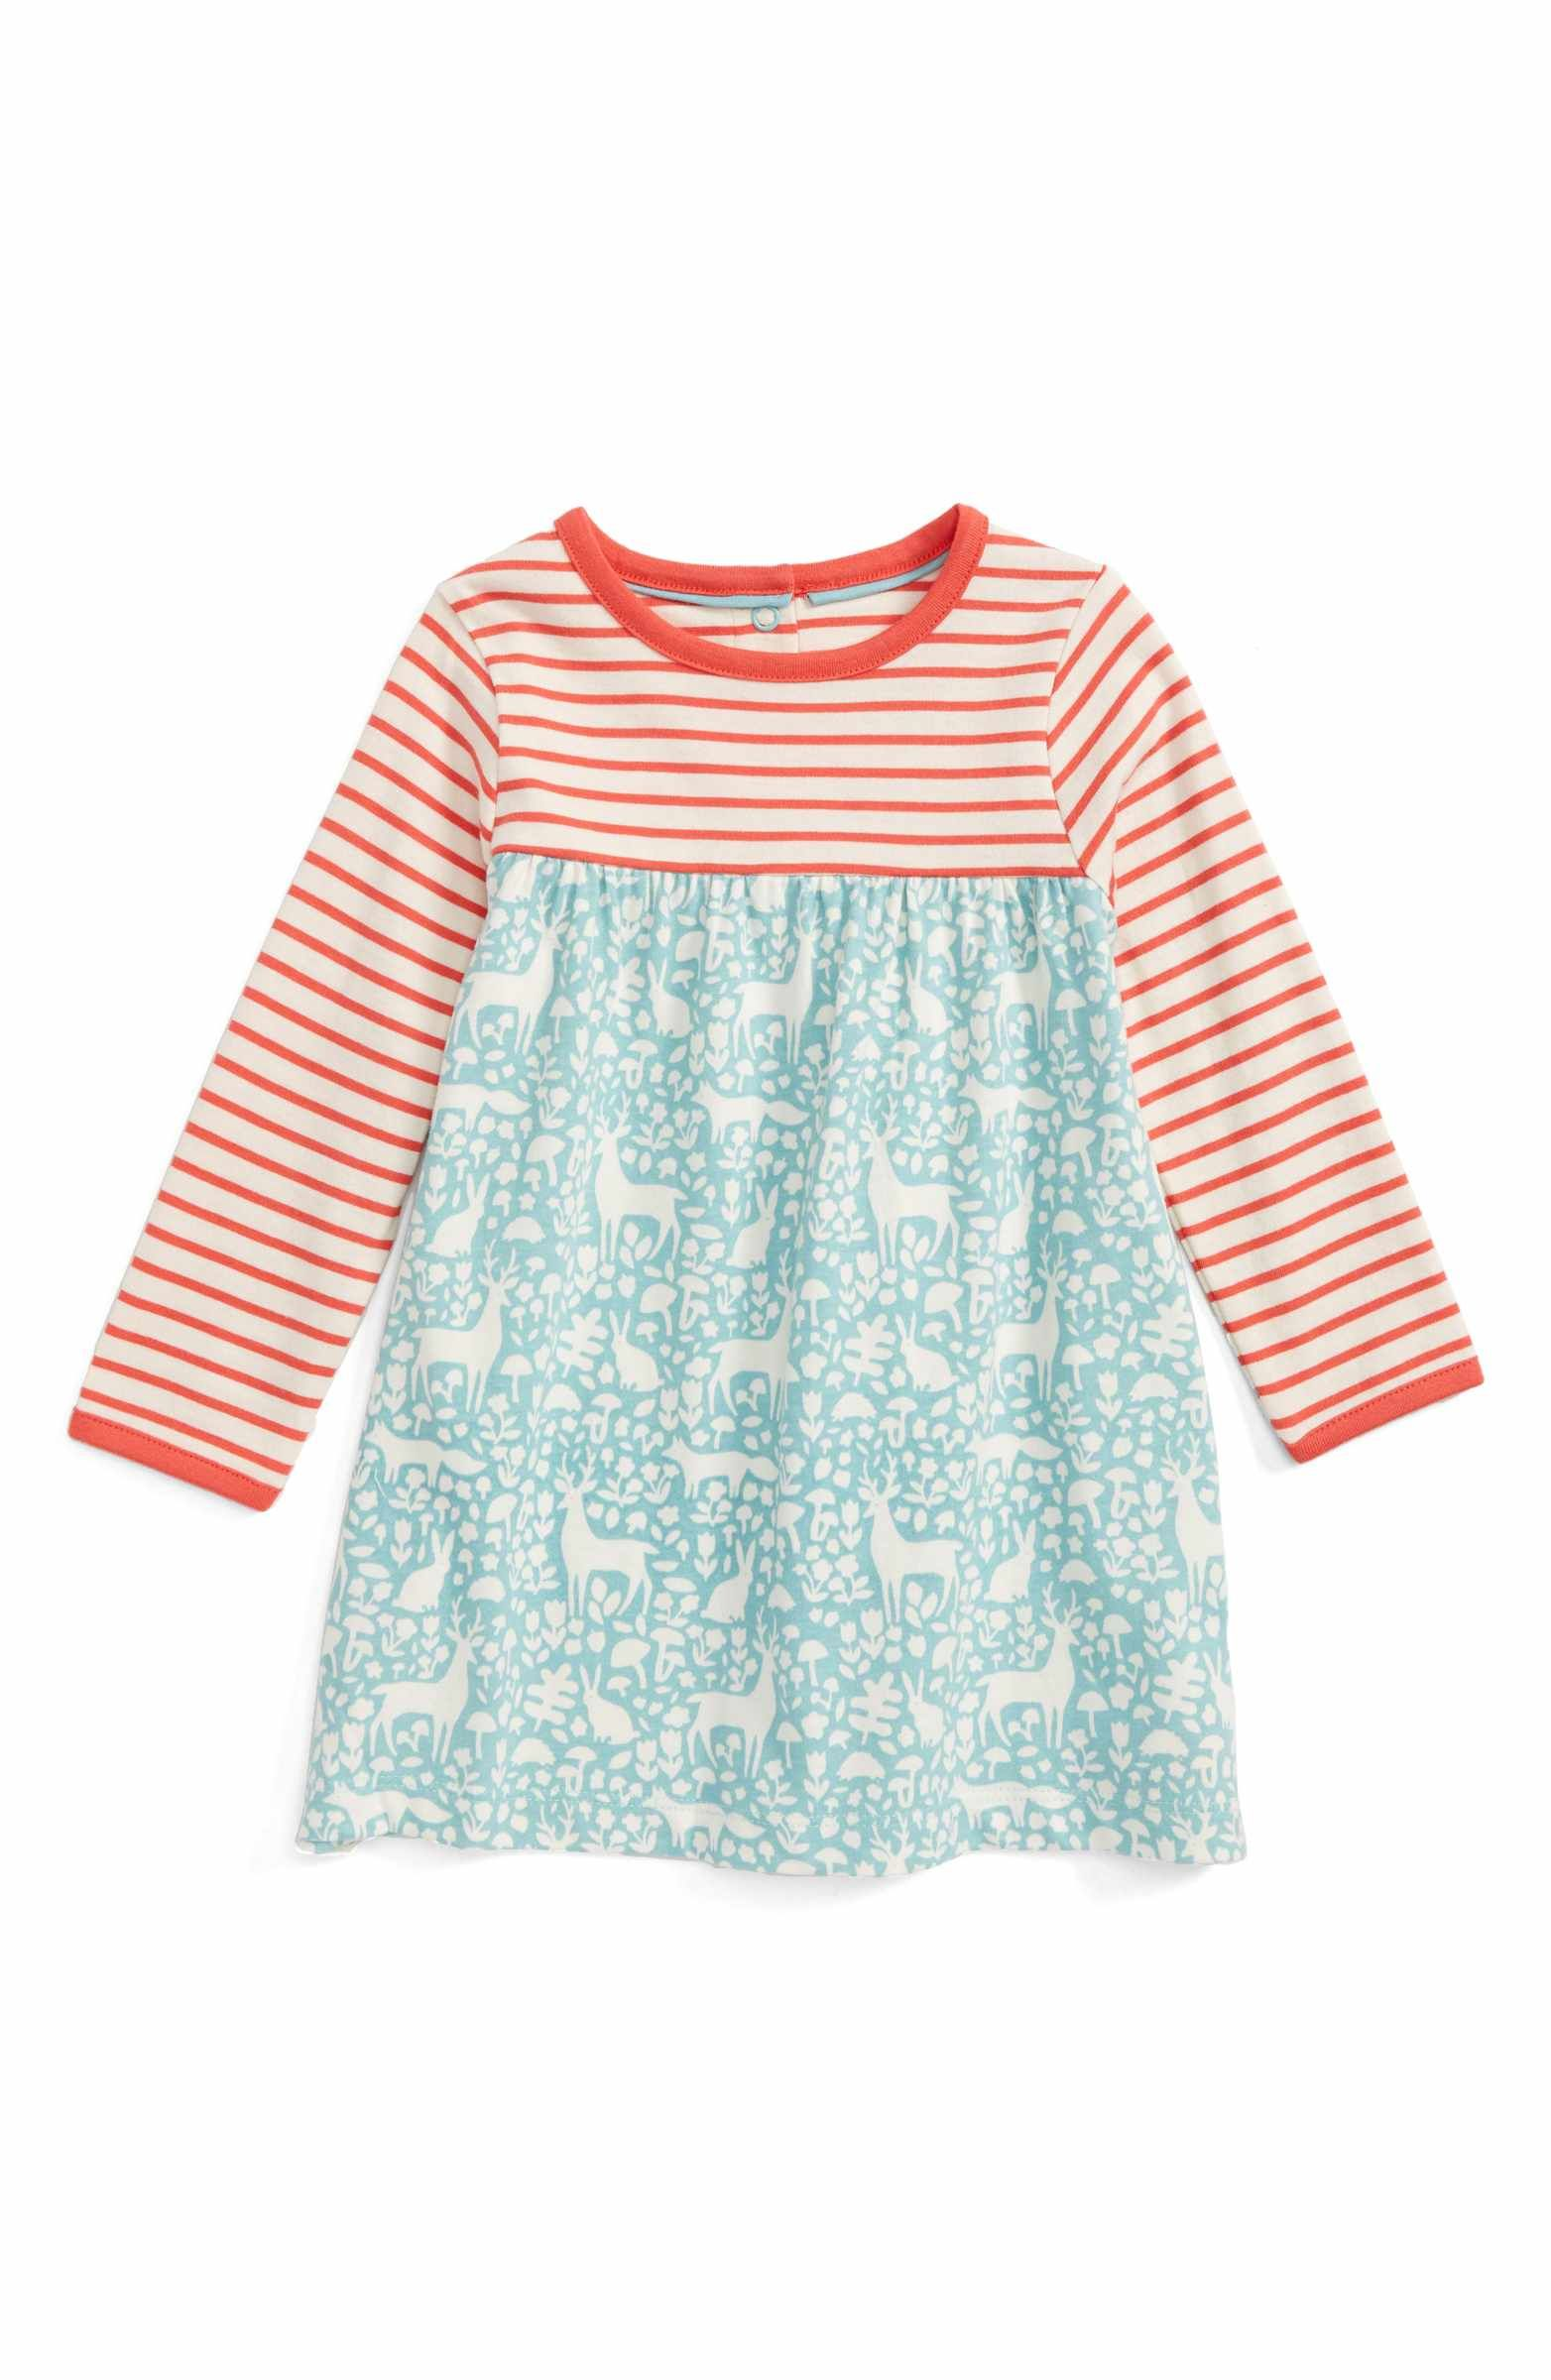 Main Image Mini Boden Hotchpotch Jersey Dress Baby Girls